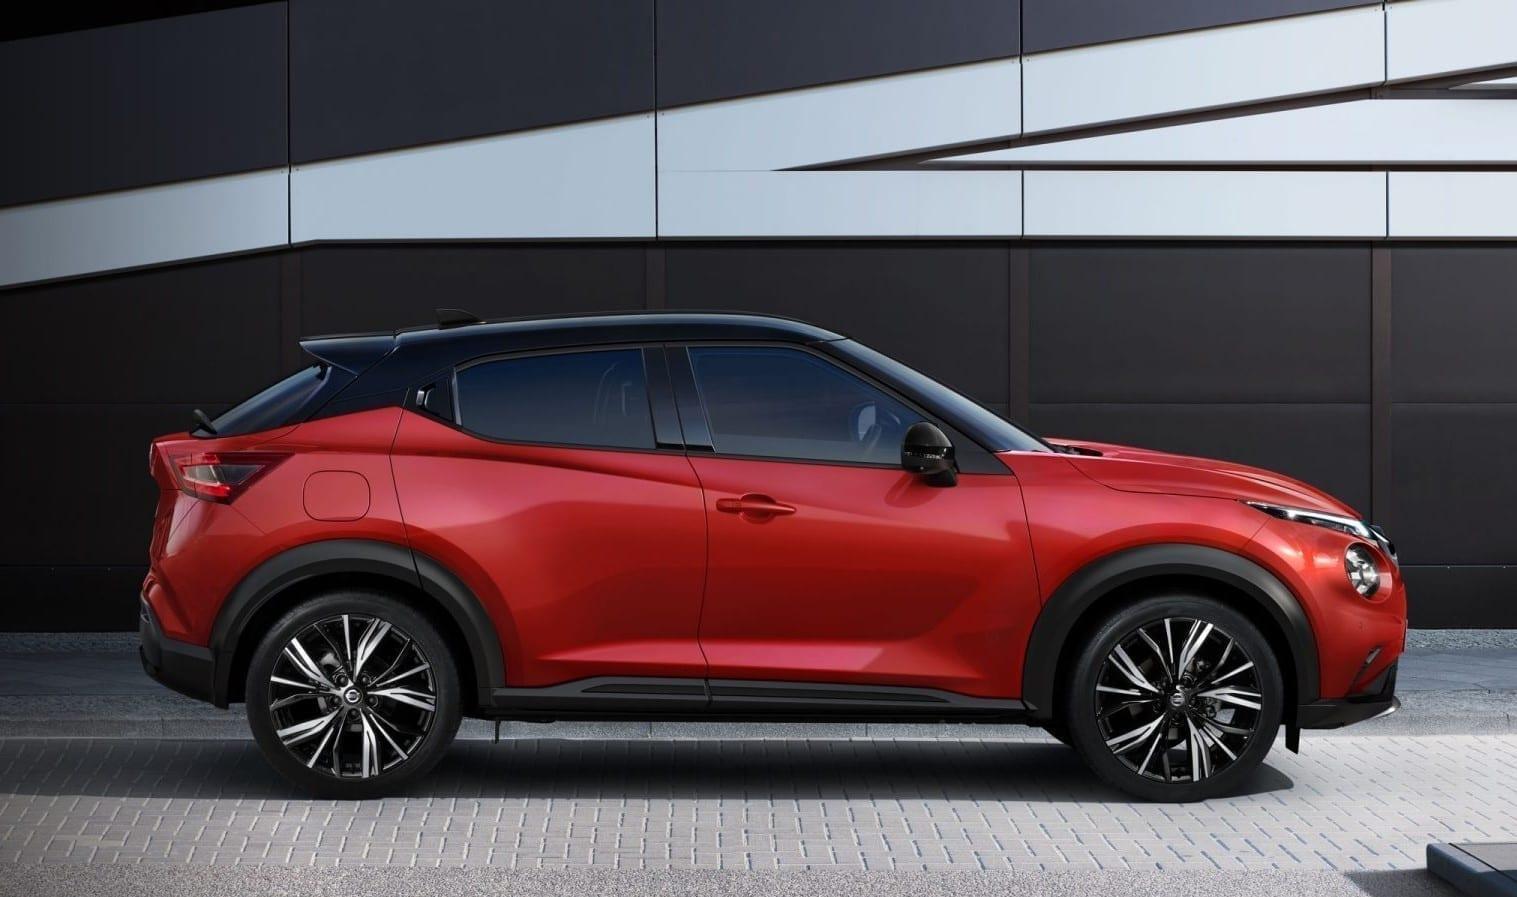 Nuevo Nissan Juke híbrido